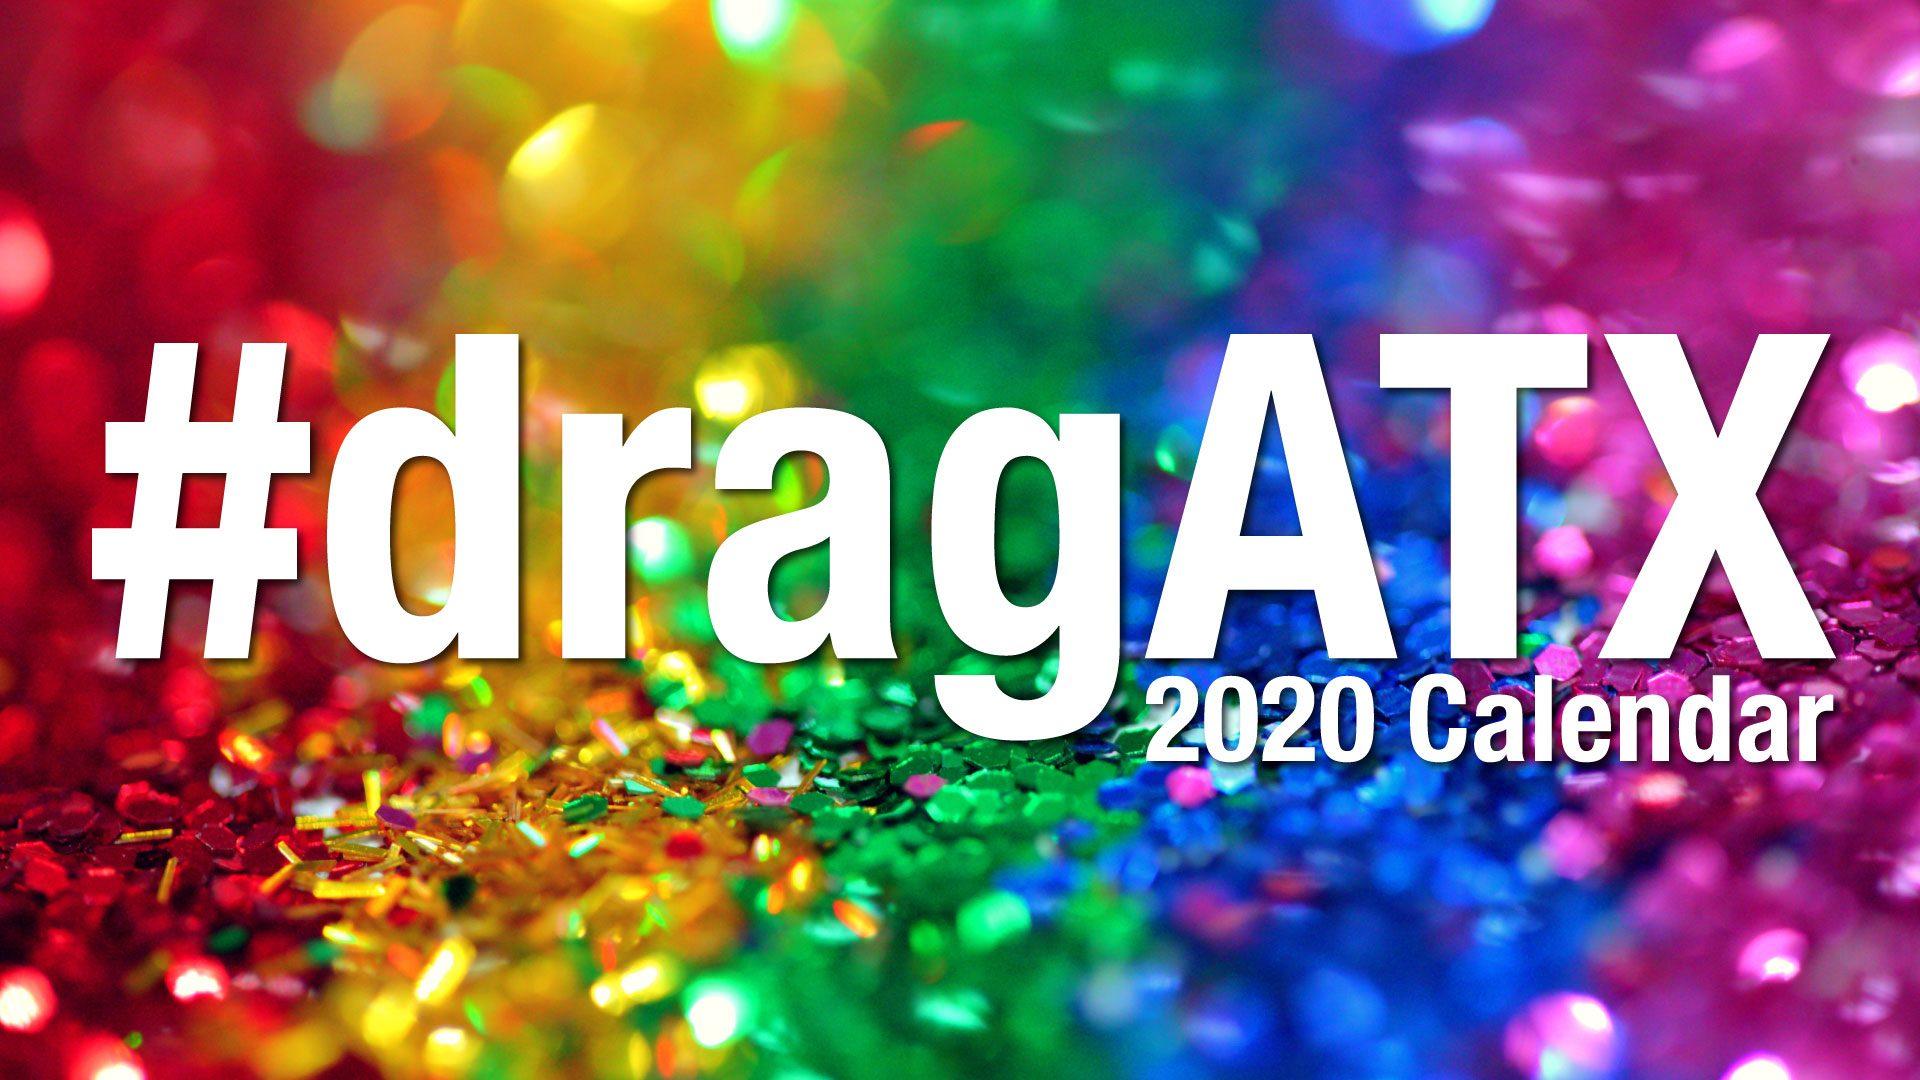 Dragatx 2020 Calendar - Therepubliq